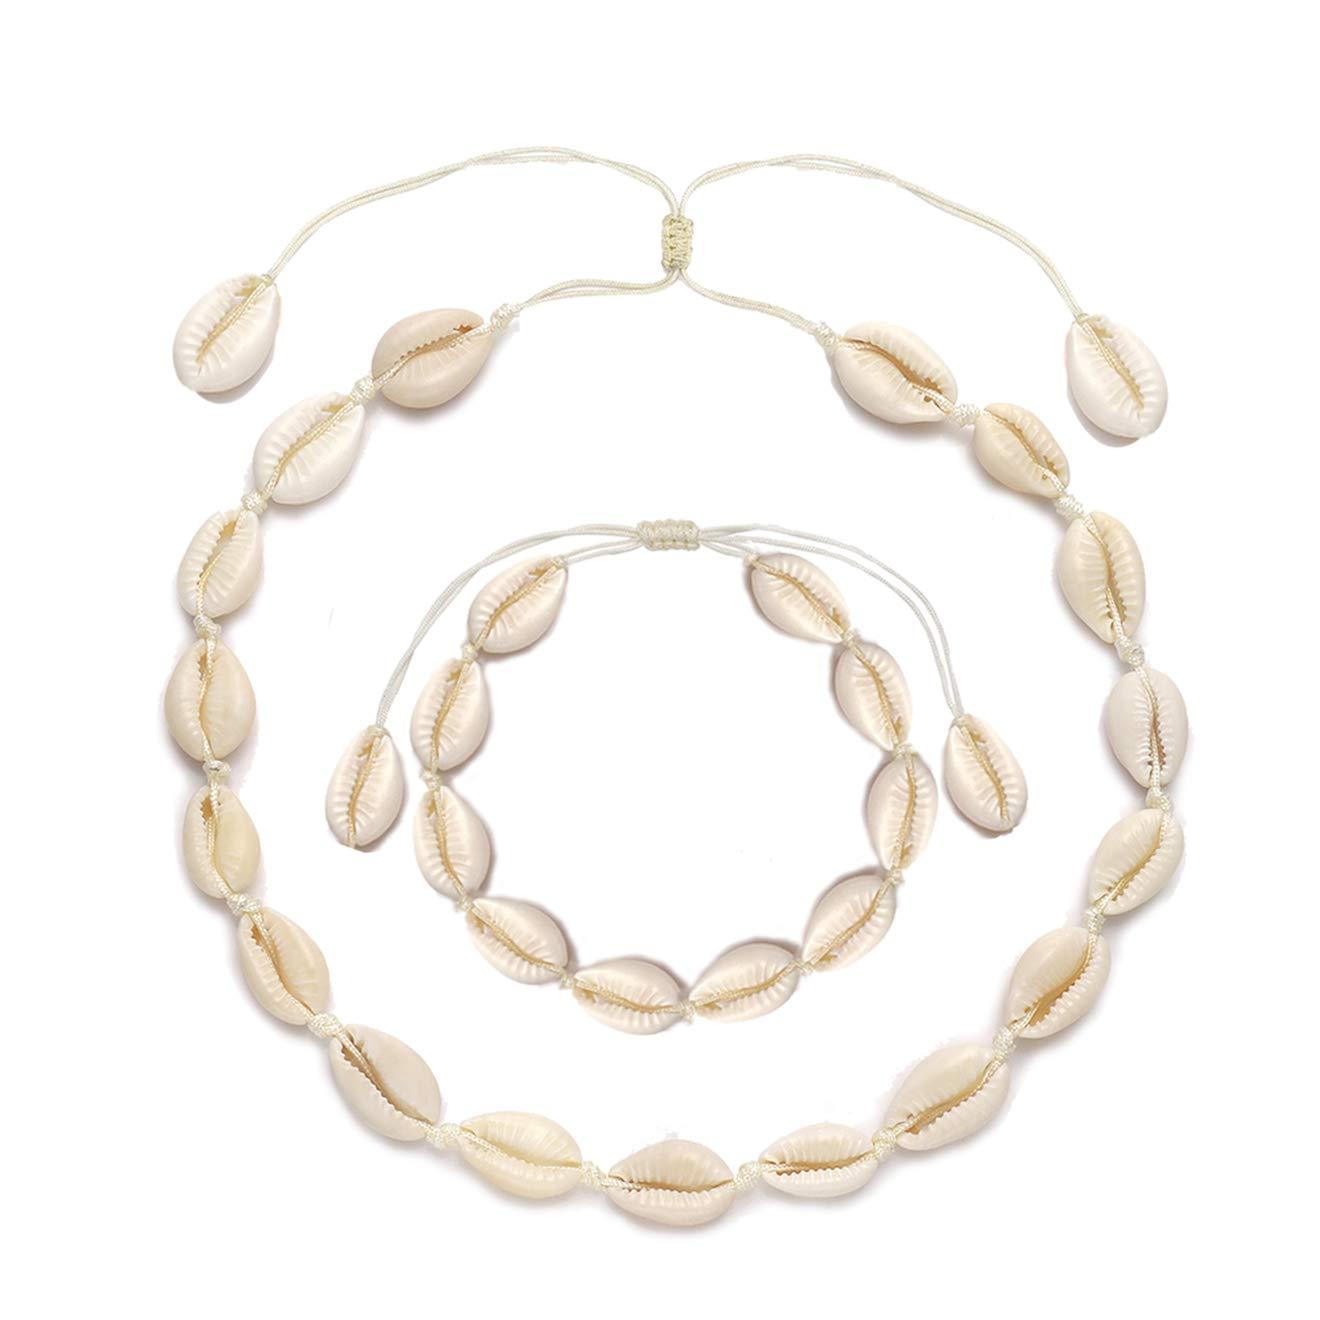 TIKCOOL Shell Choker Necklace for Women Seashell Bracelets Set Puka Shell Necklace Summer Beach Jewelry